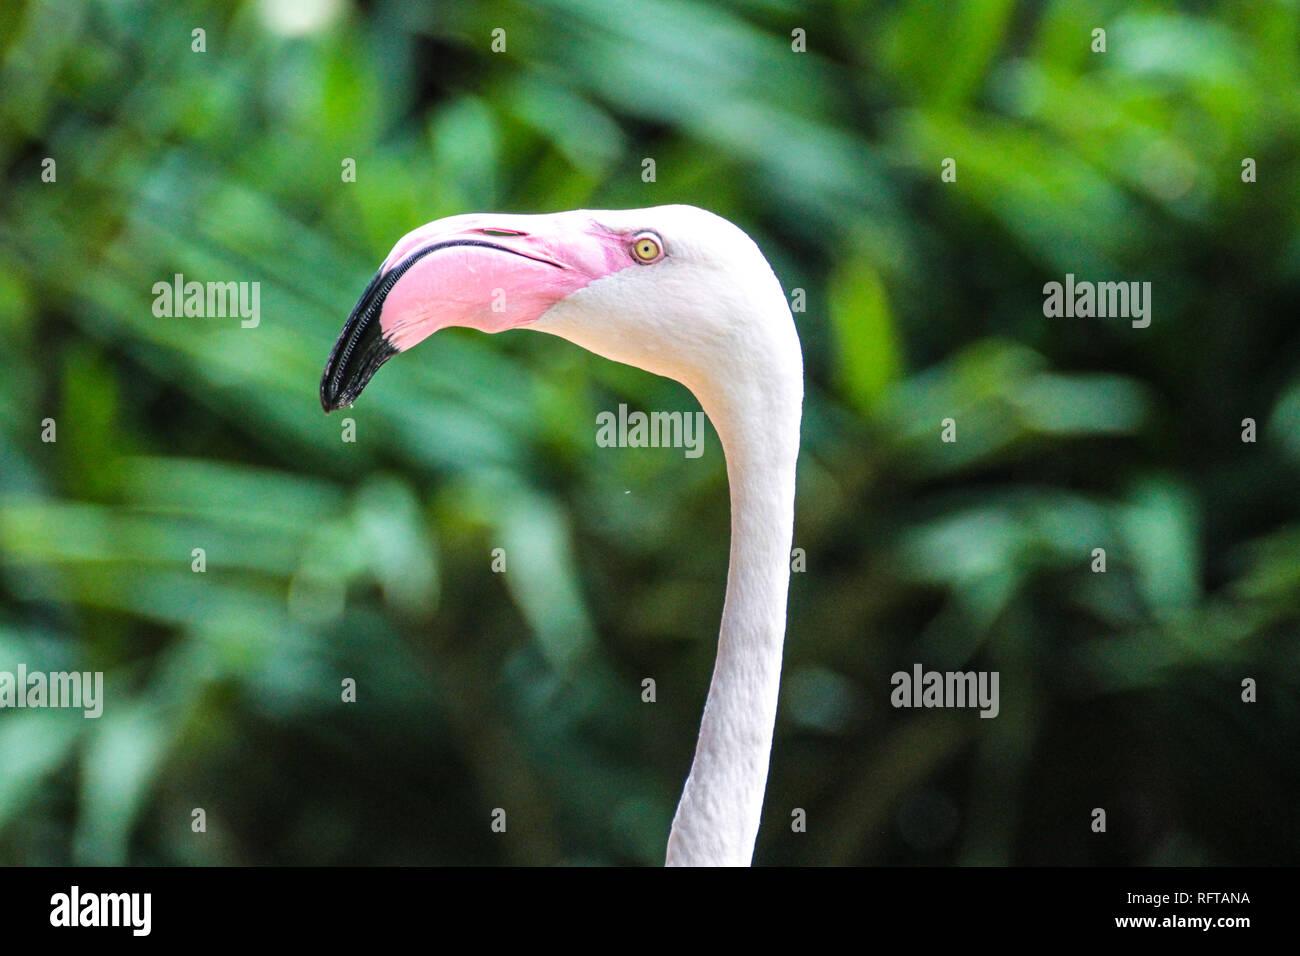 Rosa Flamingo - Stock Image